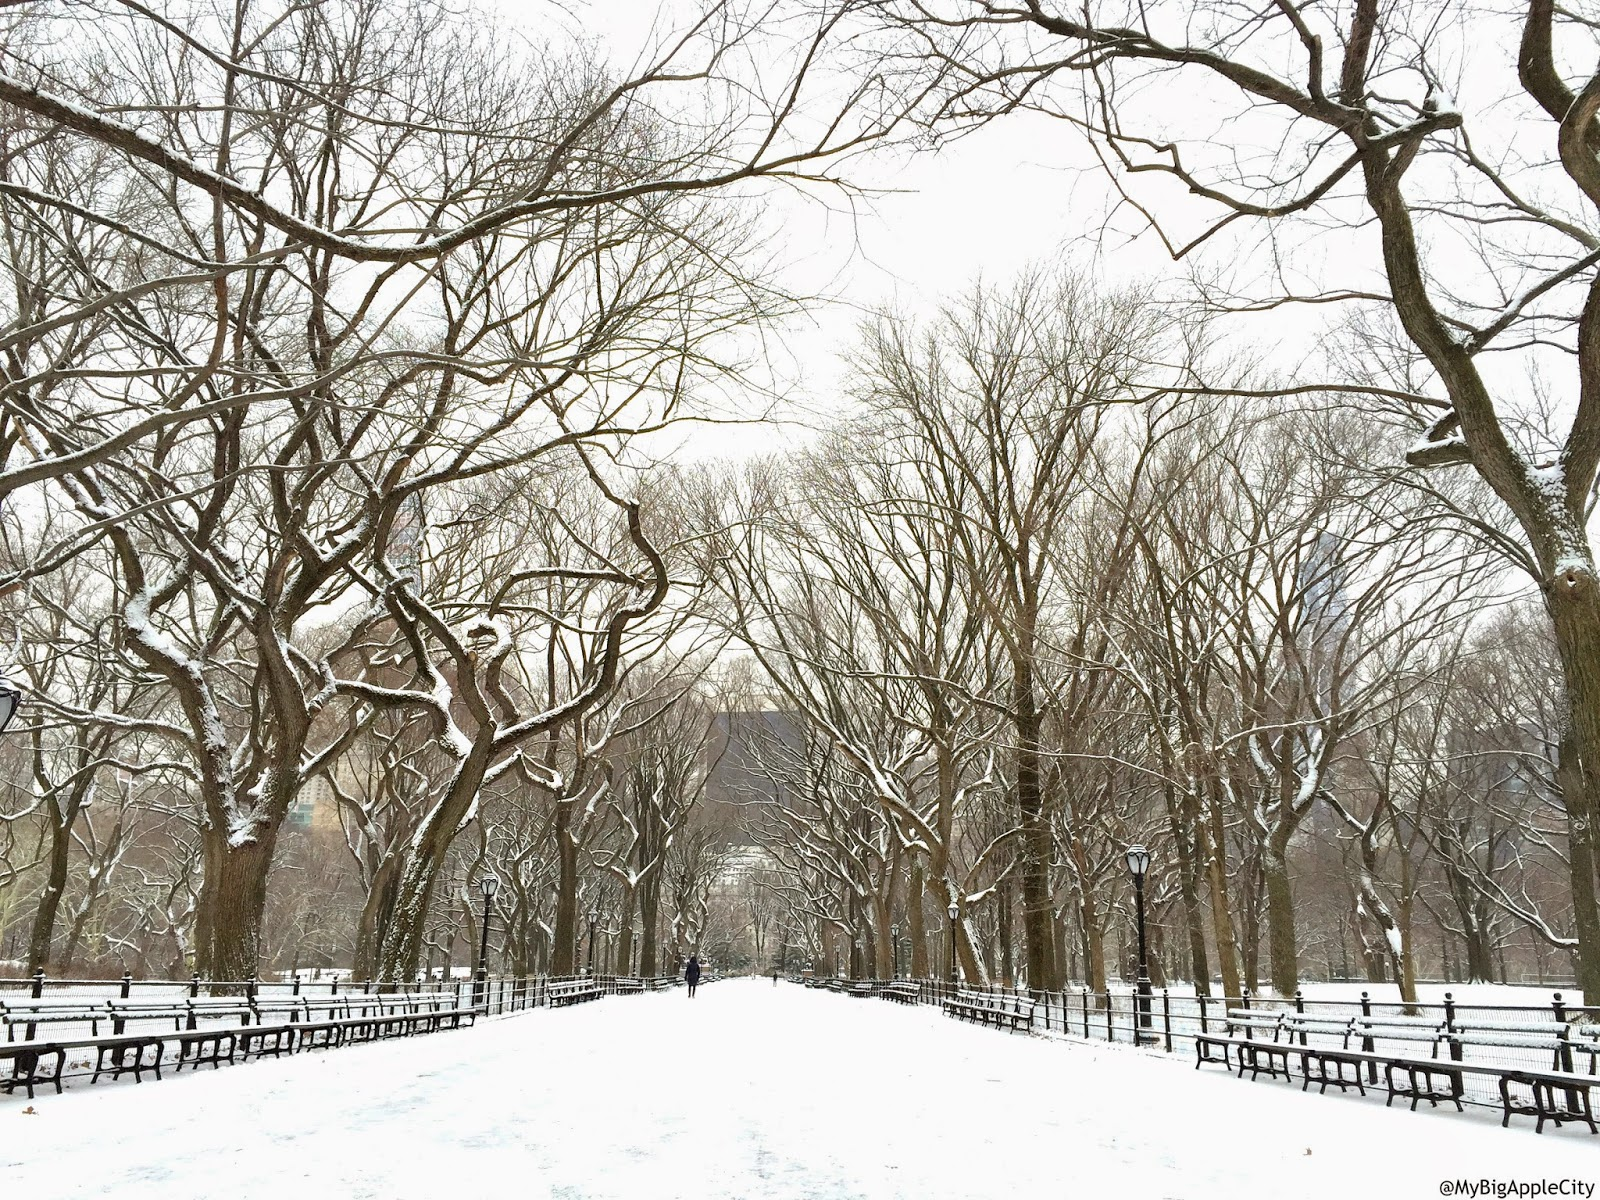 juno-2015-NYC-Blizzard-love-central-park